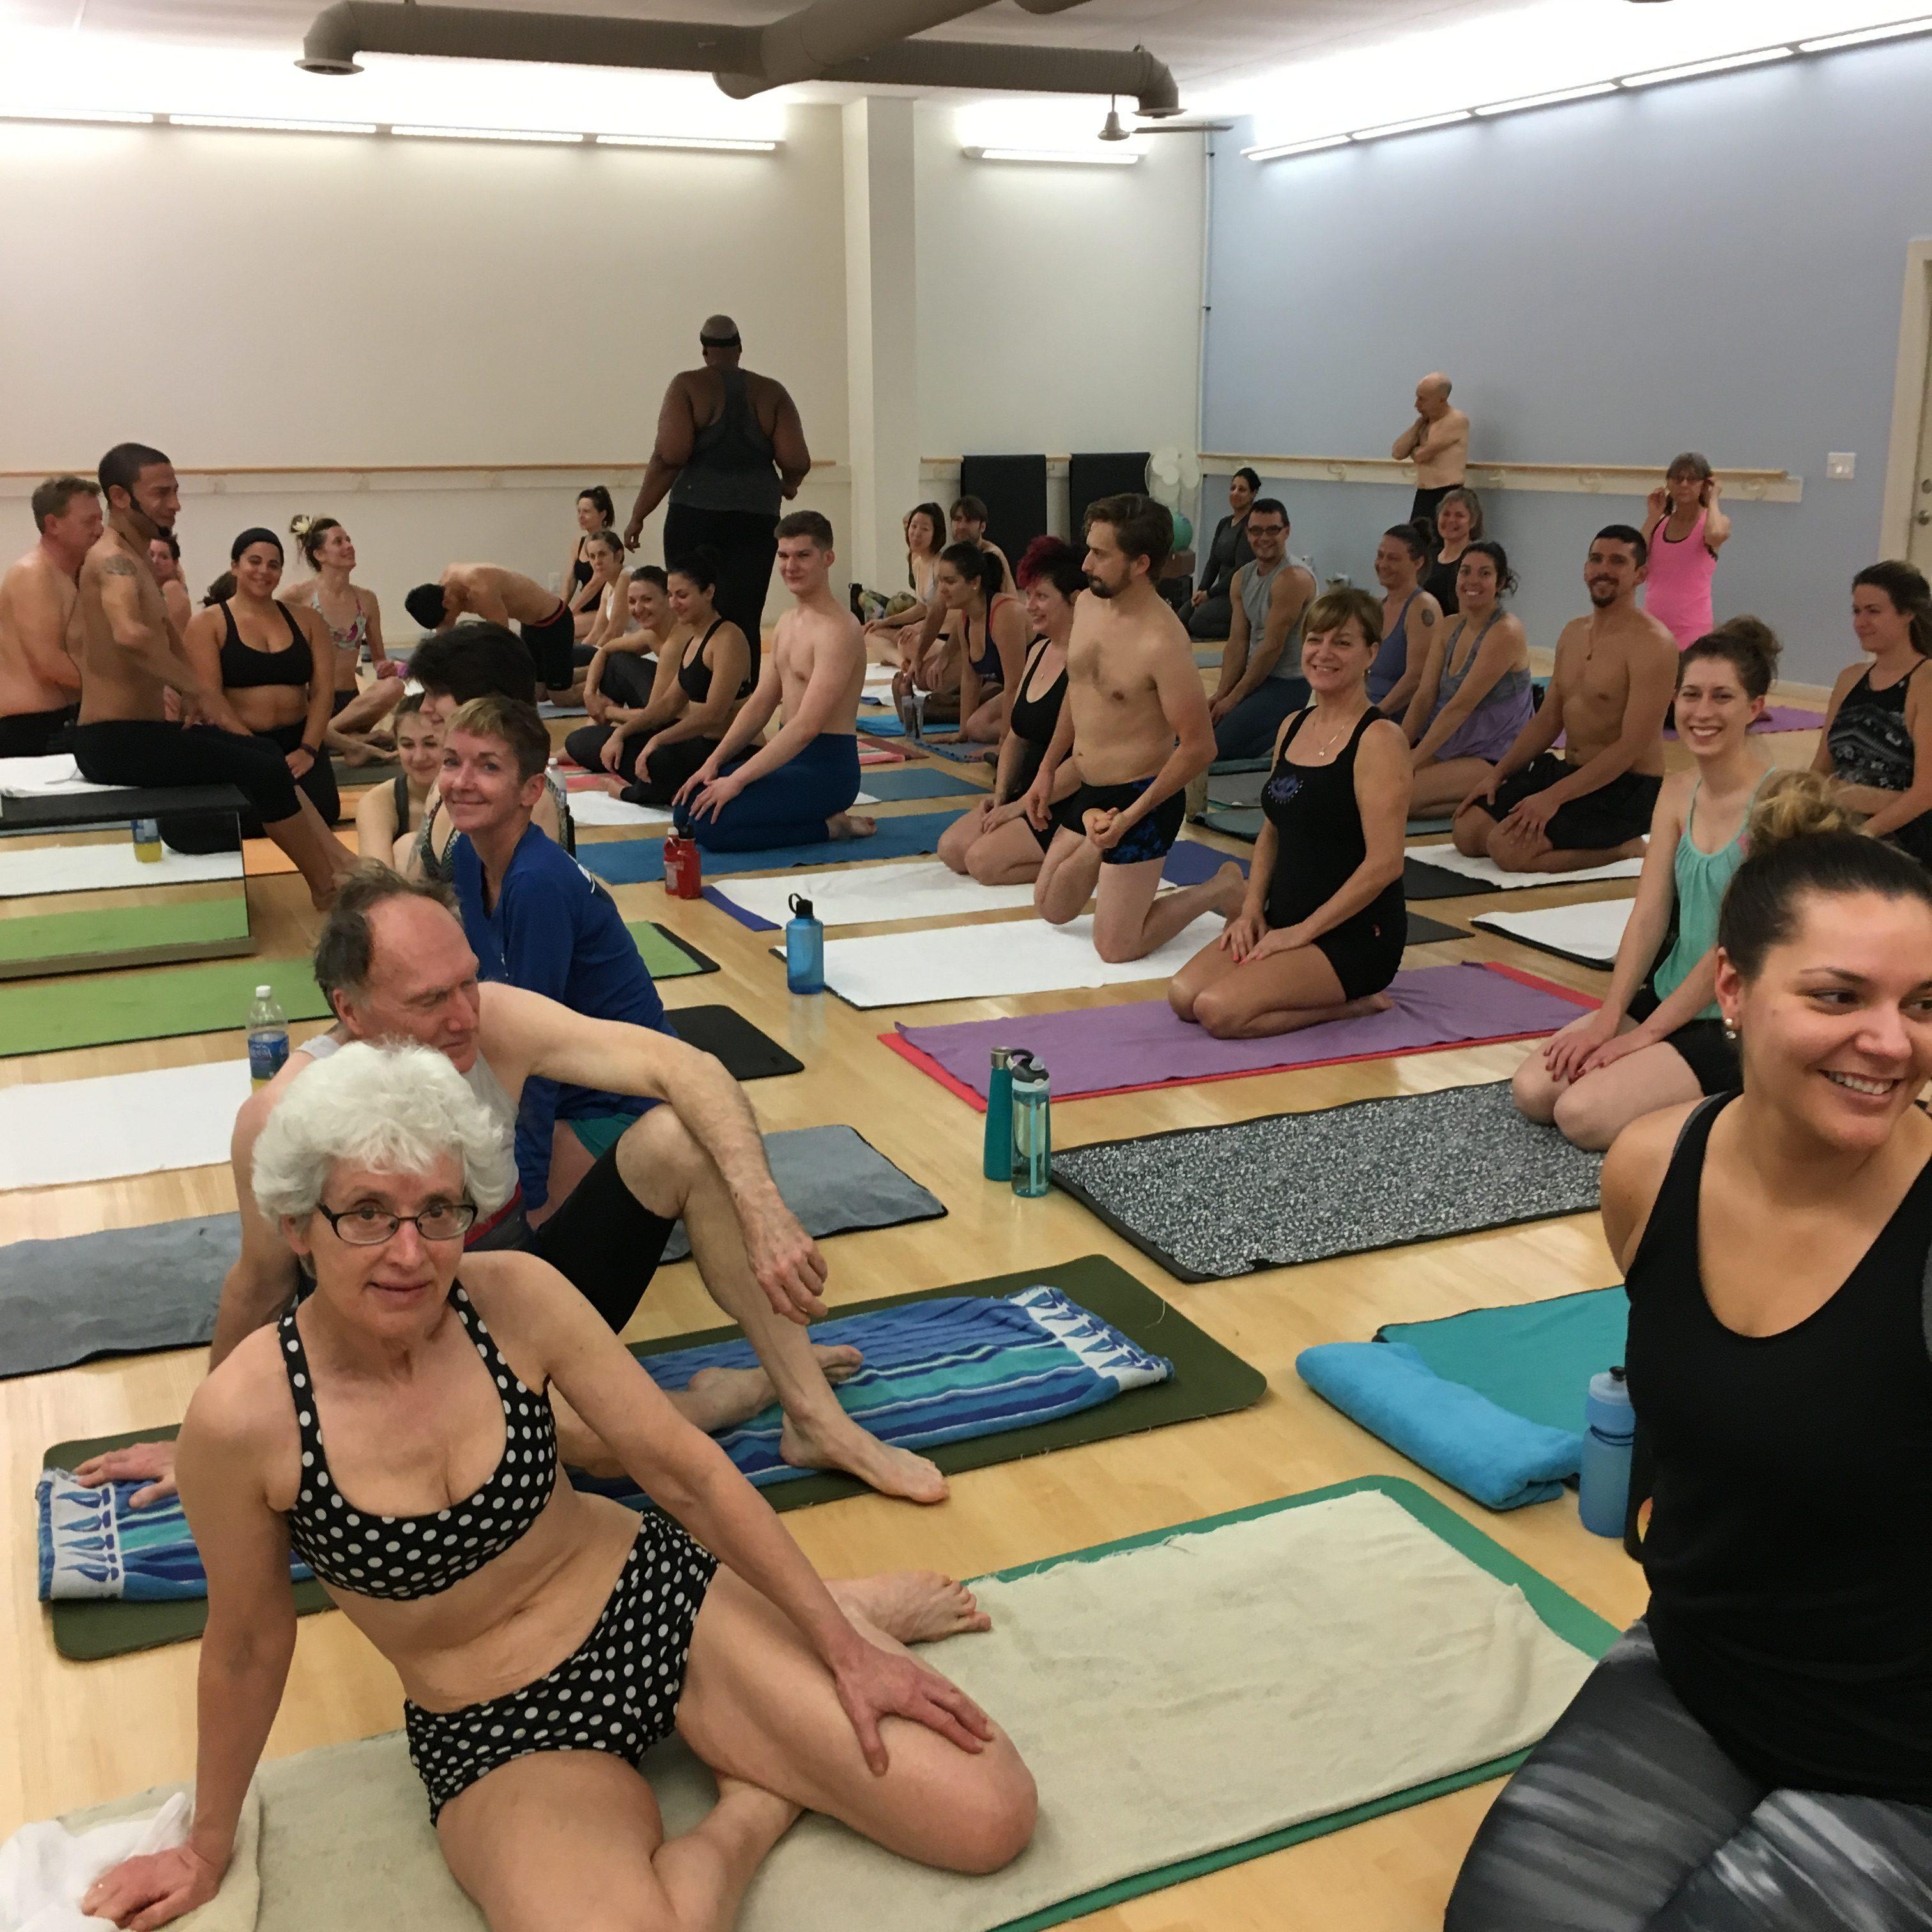 Free Weights Winnipeg: Yoga Elmhurst Winnipeg